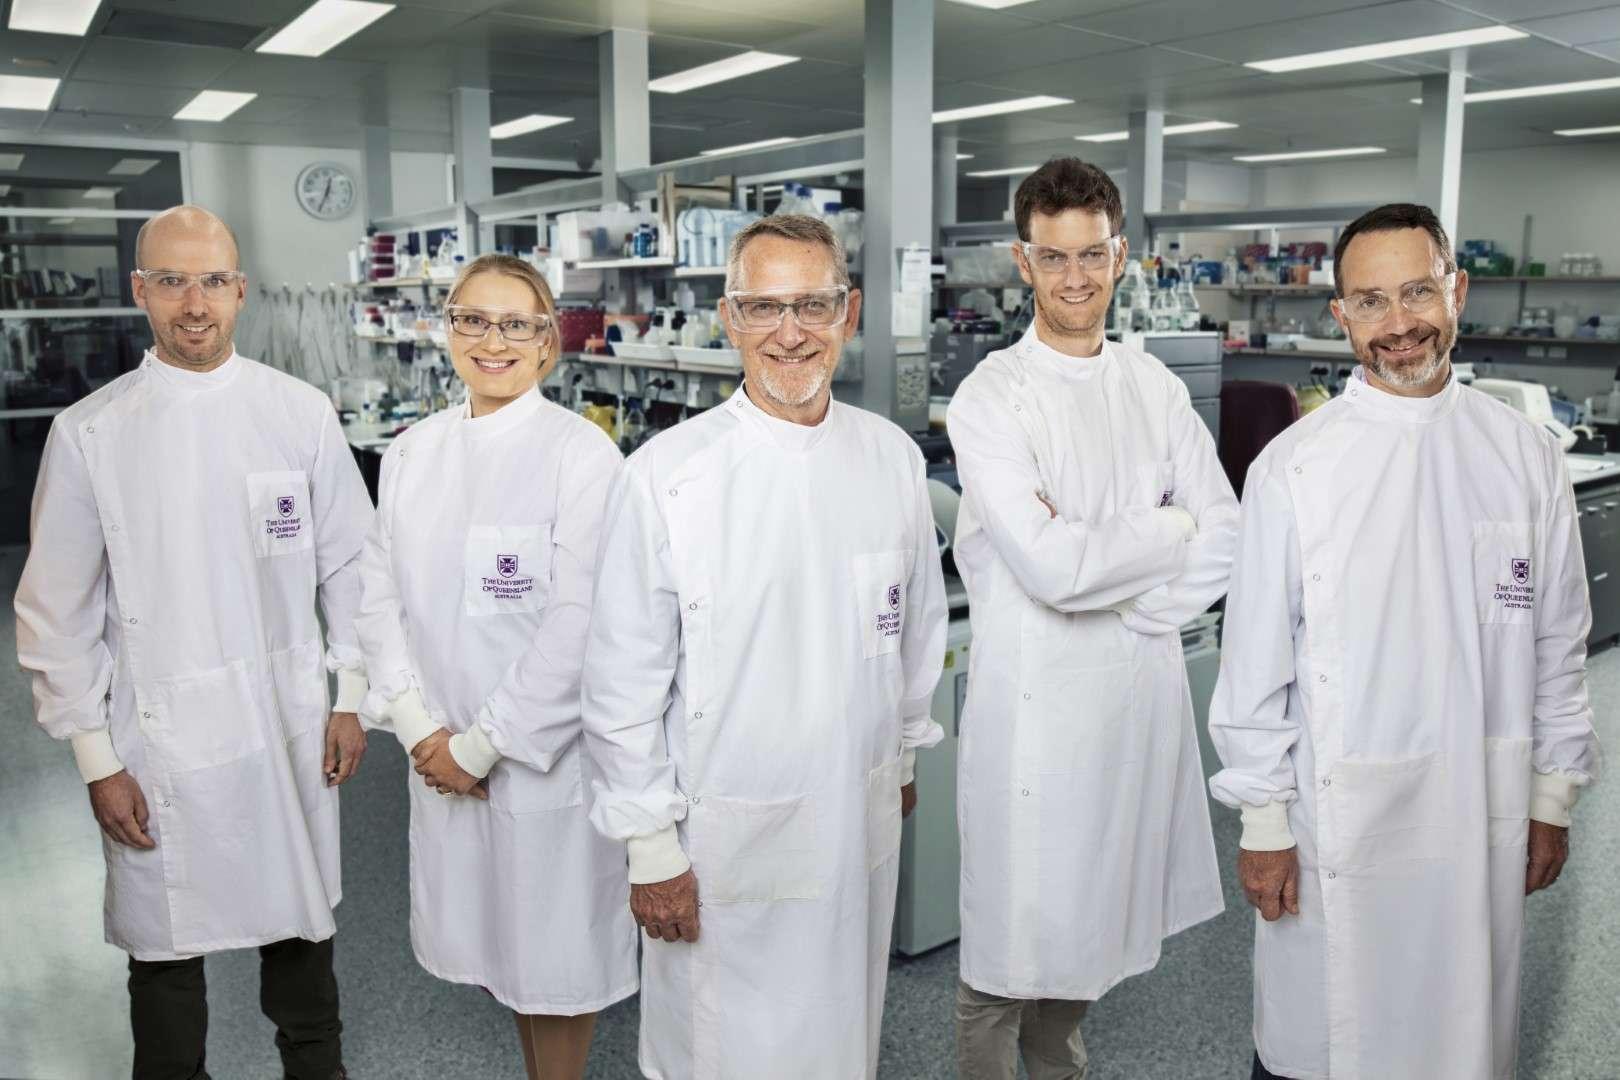 The University of Queensland COVID-19 vaccine team.